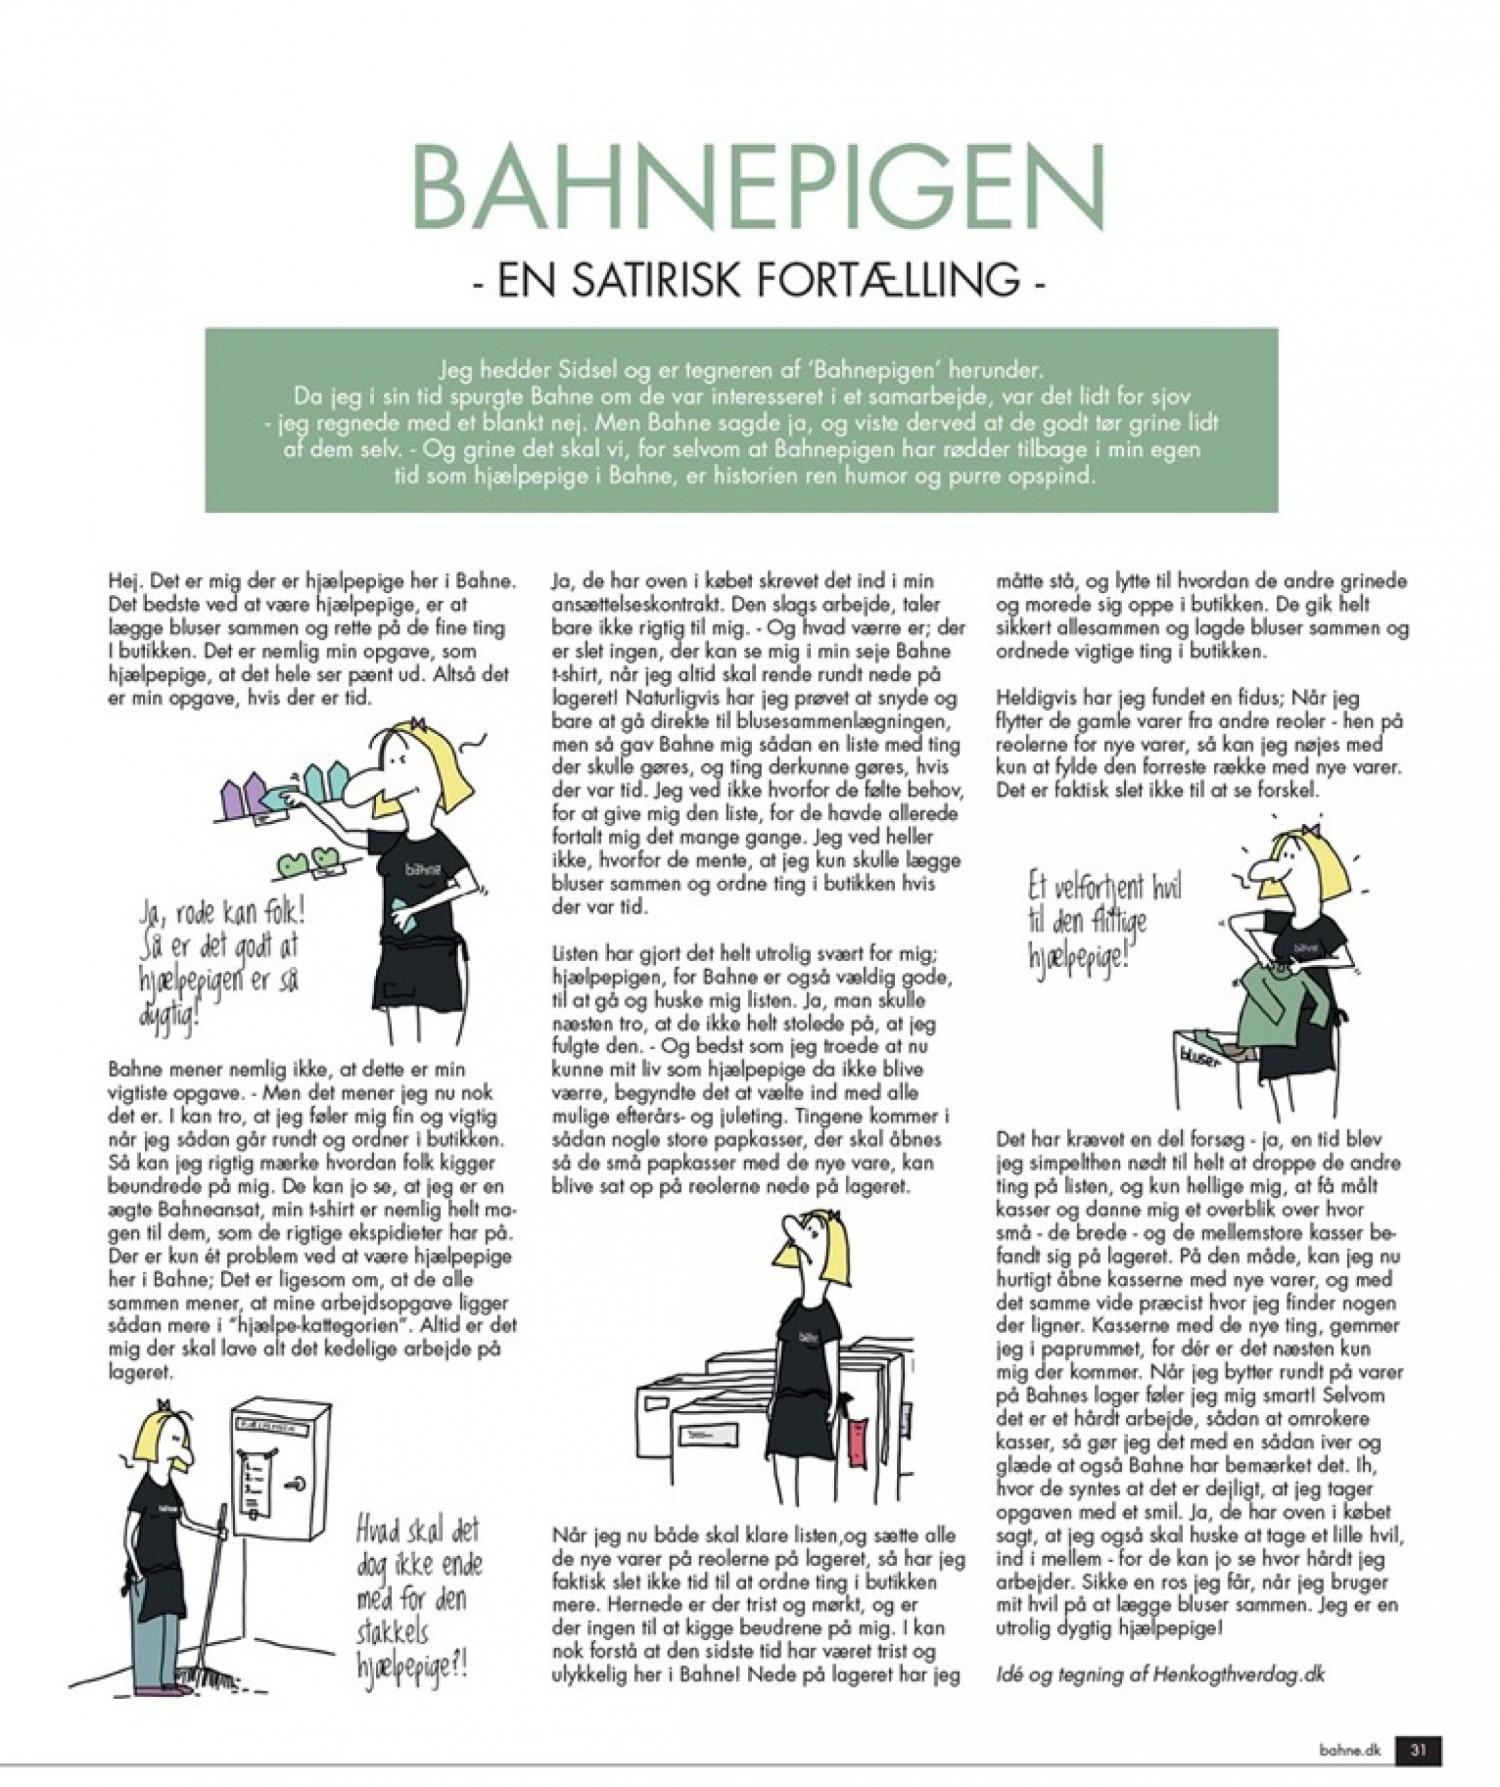 Bahnepigen_for_bahne